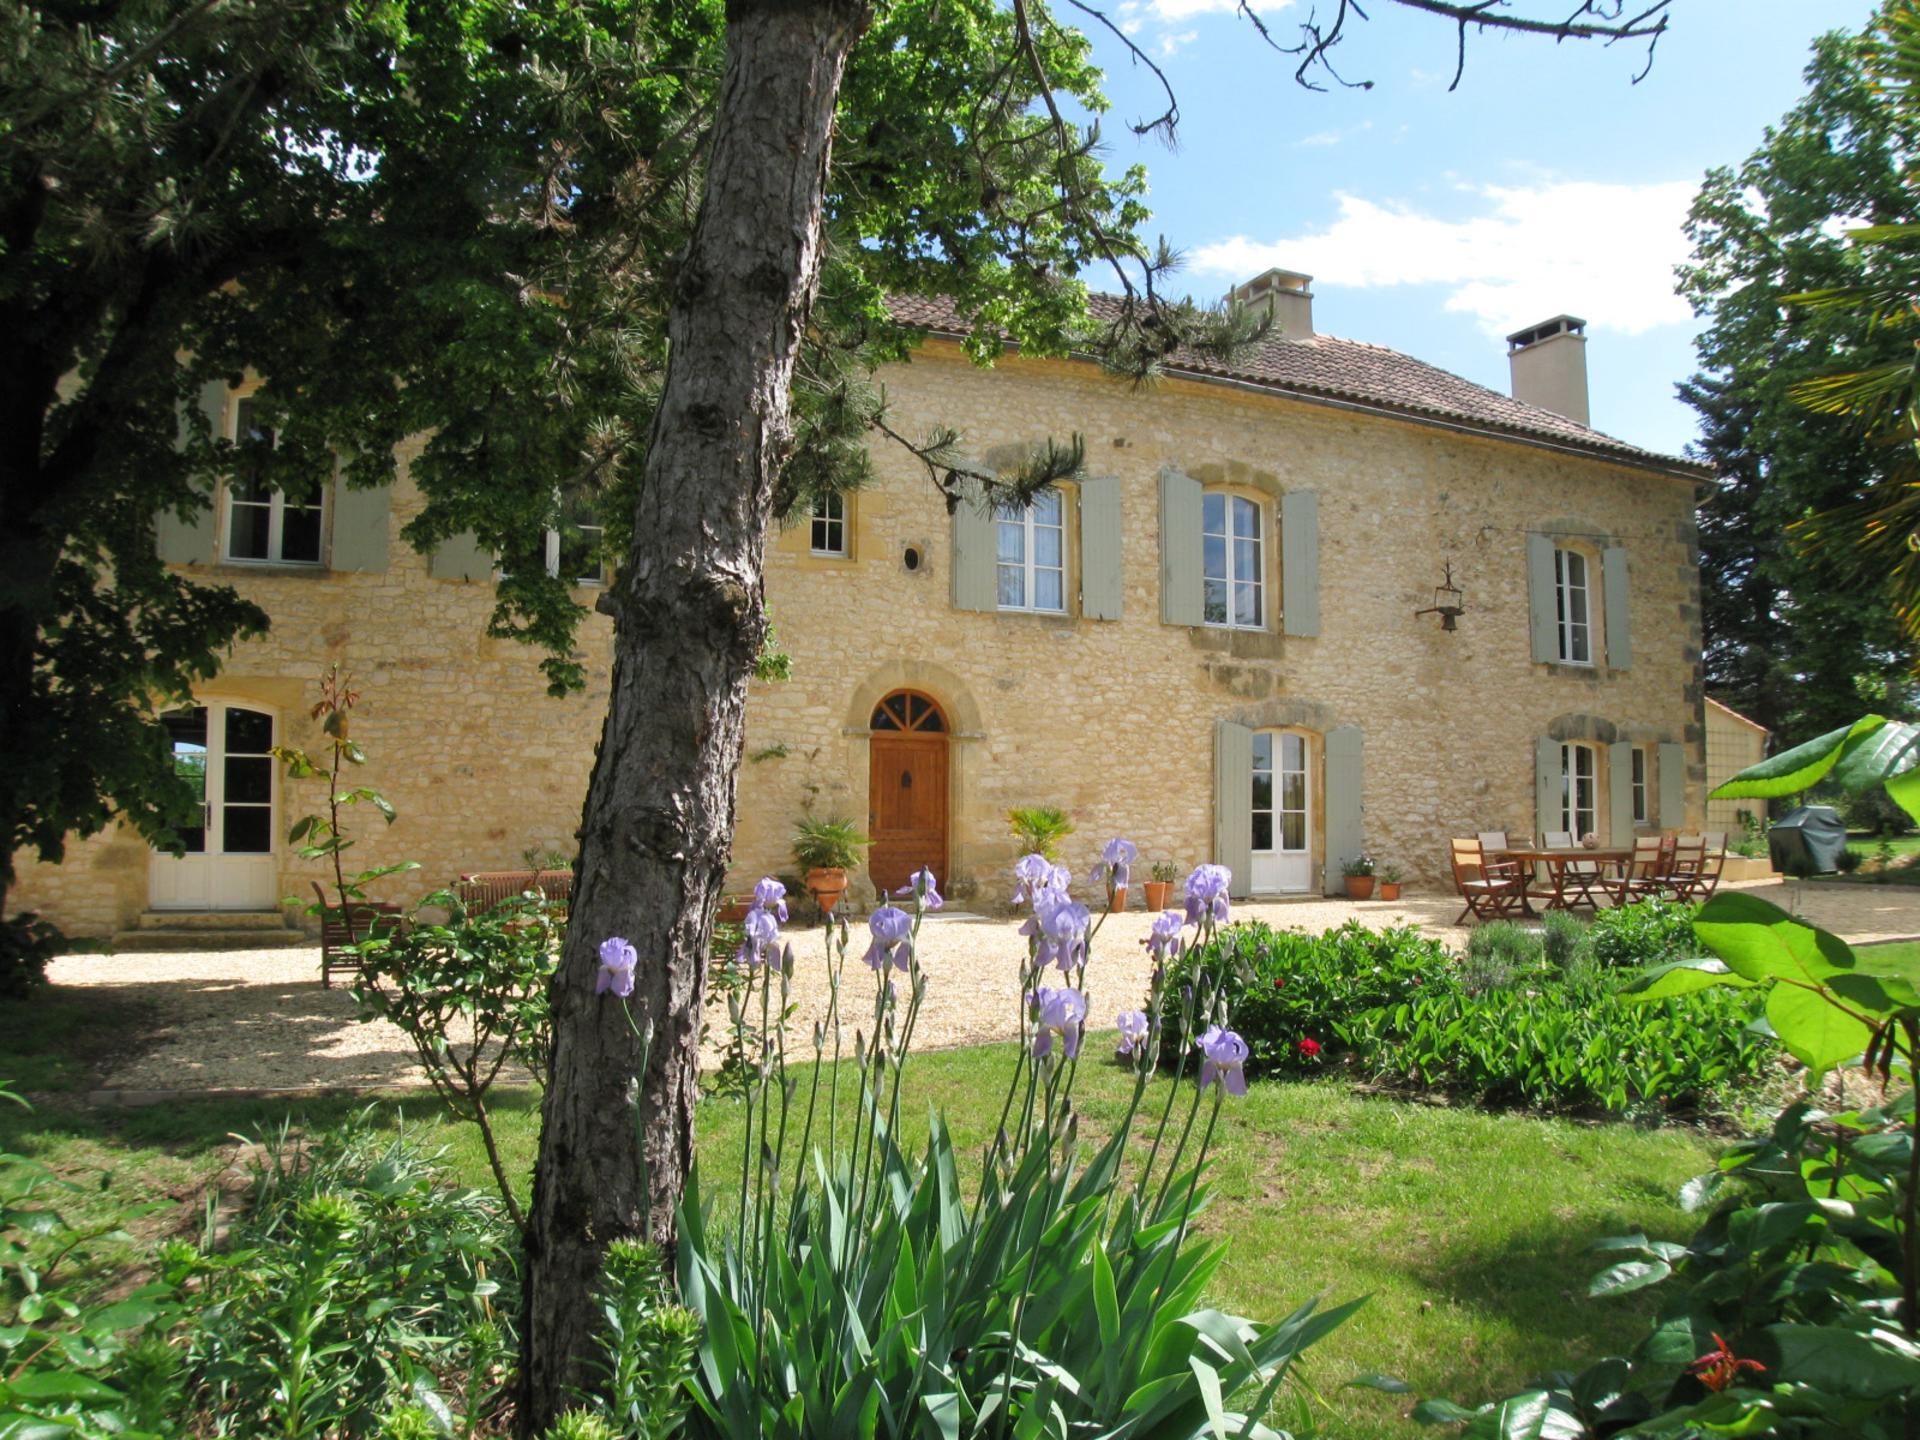 Villa Garden, Domaine de Maitre, Monpazier, Dordogne.